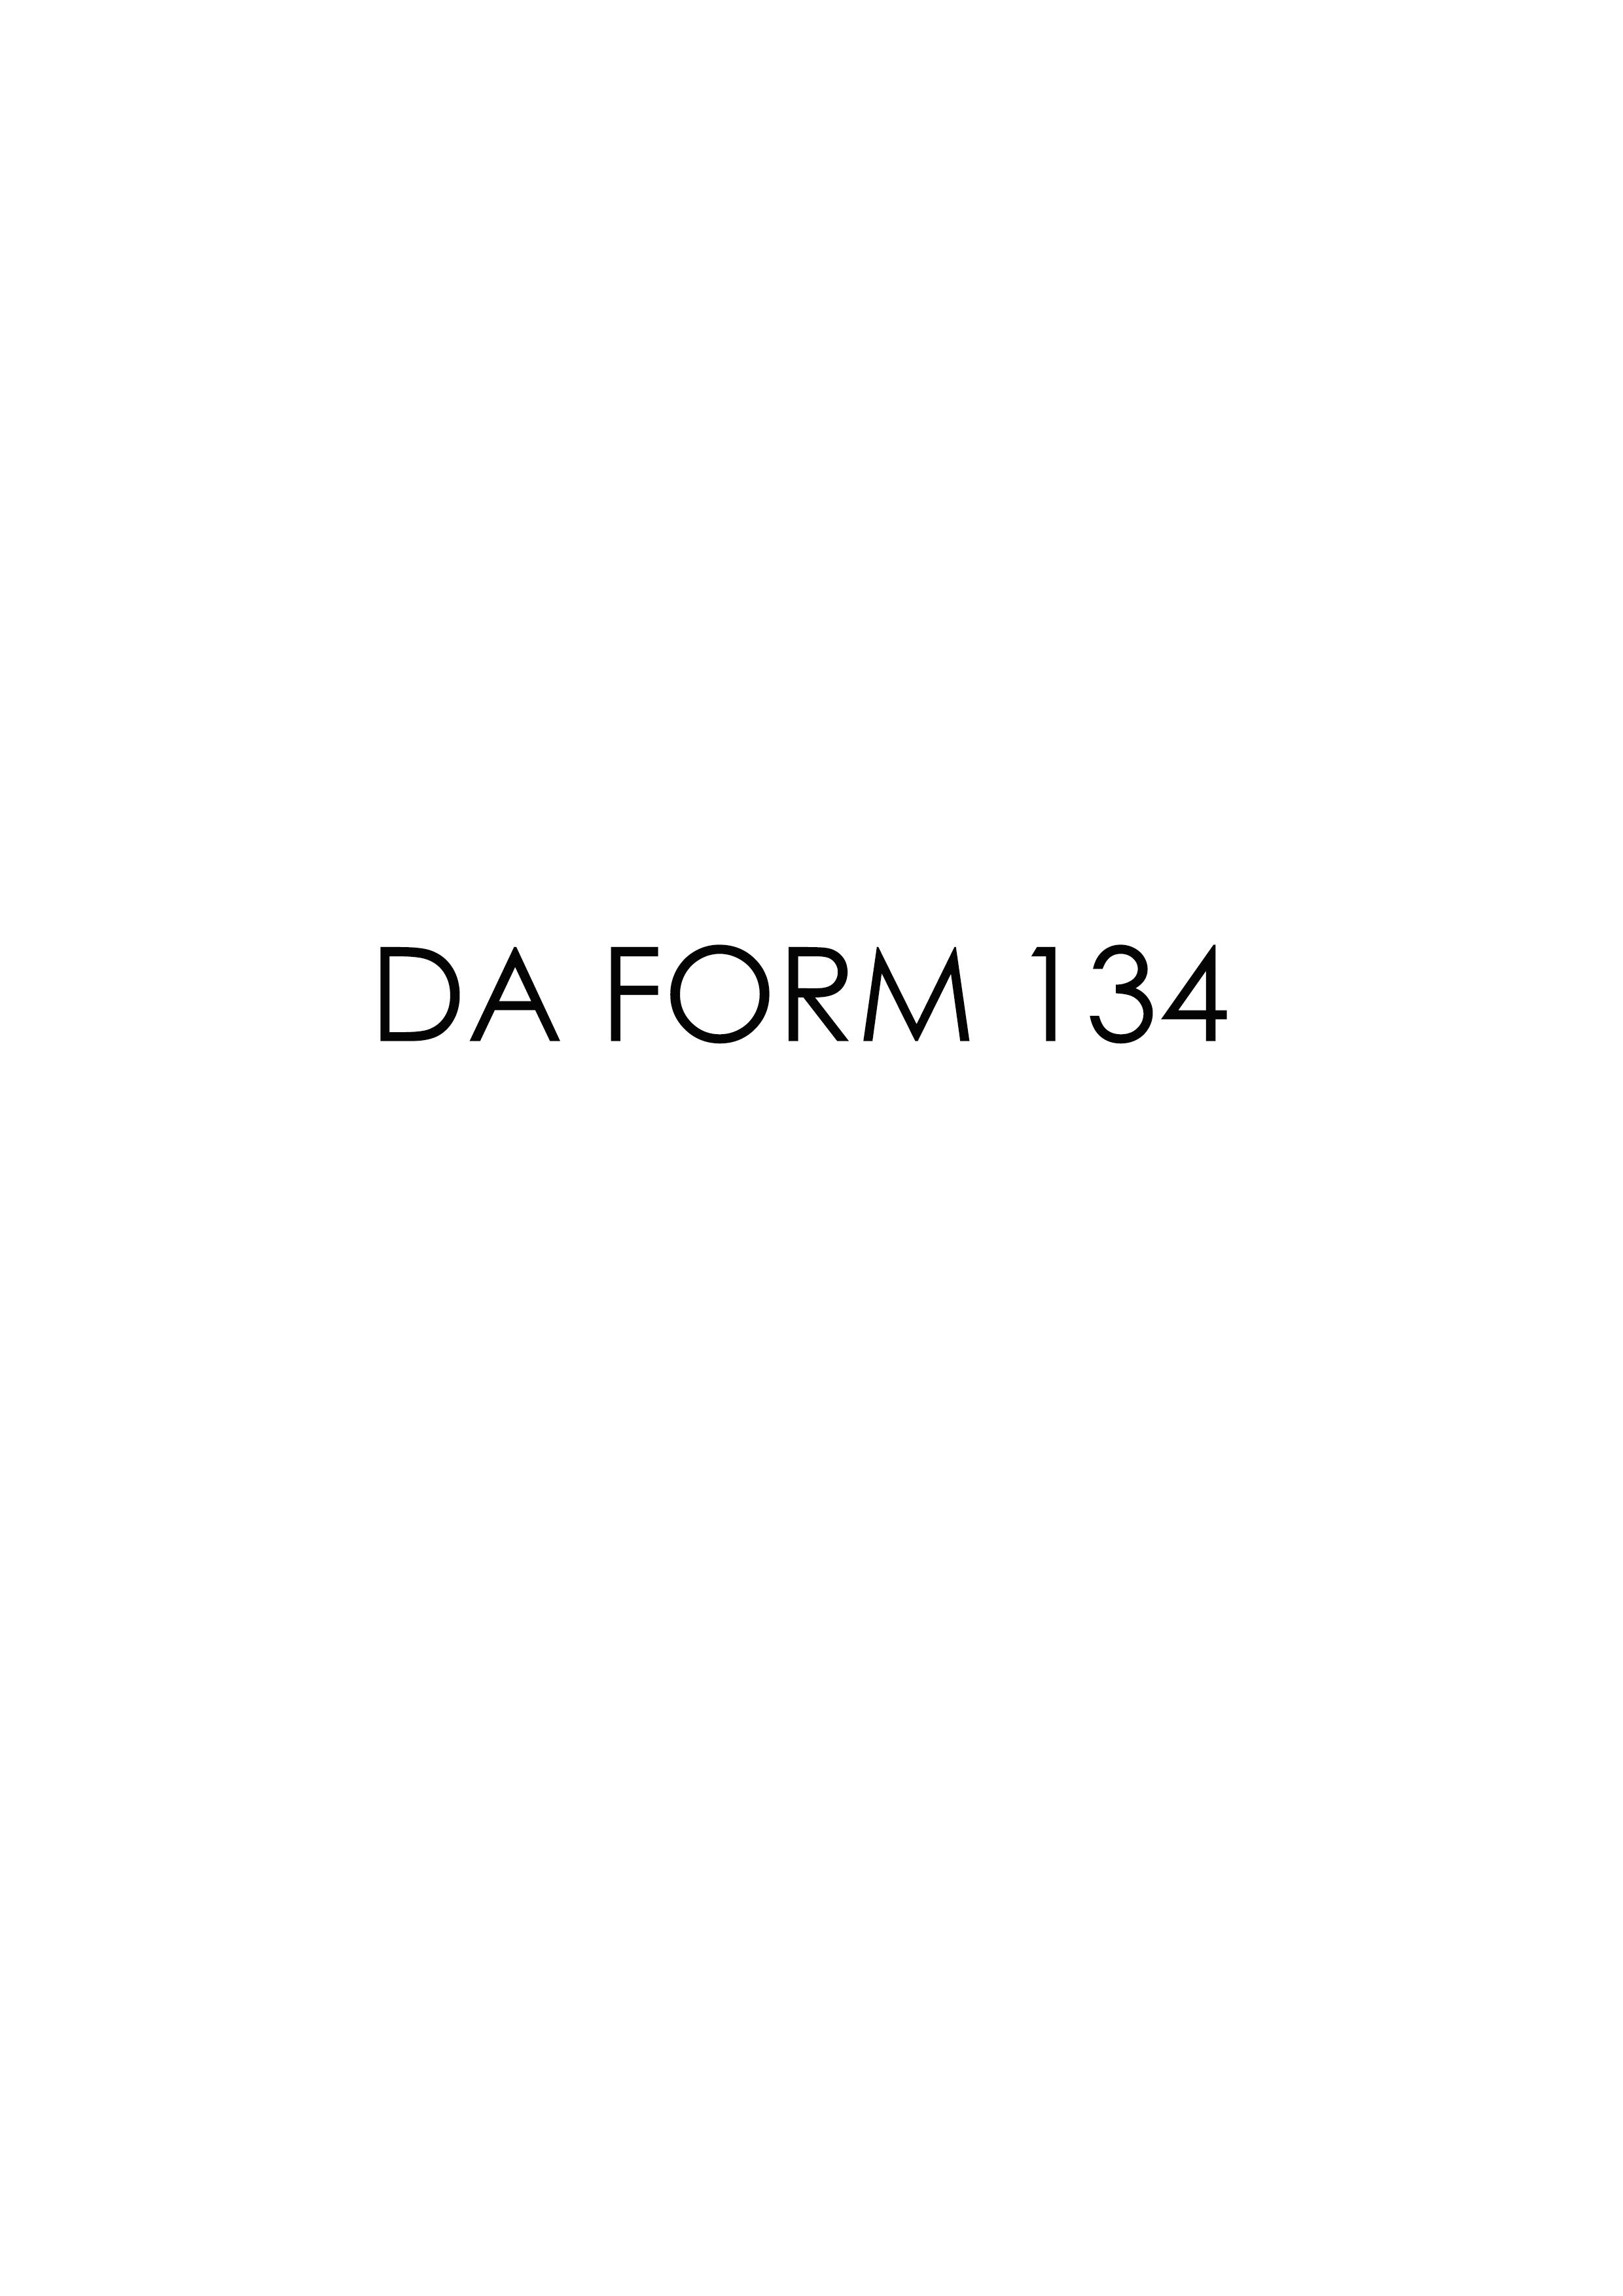 Download Fillable da Form 134